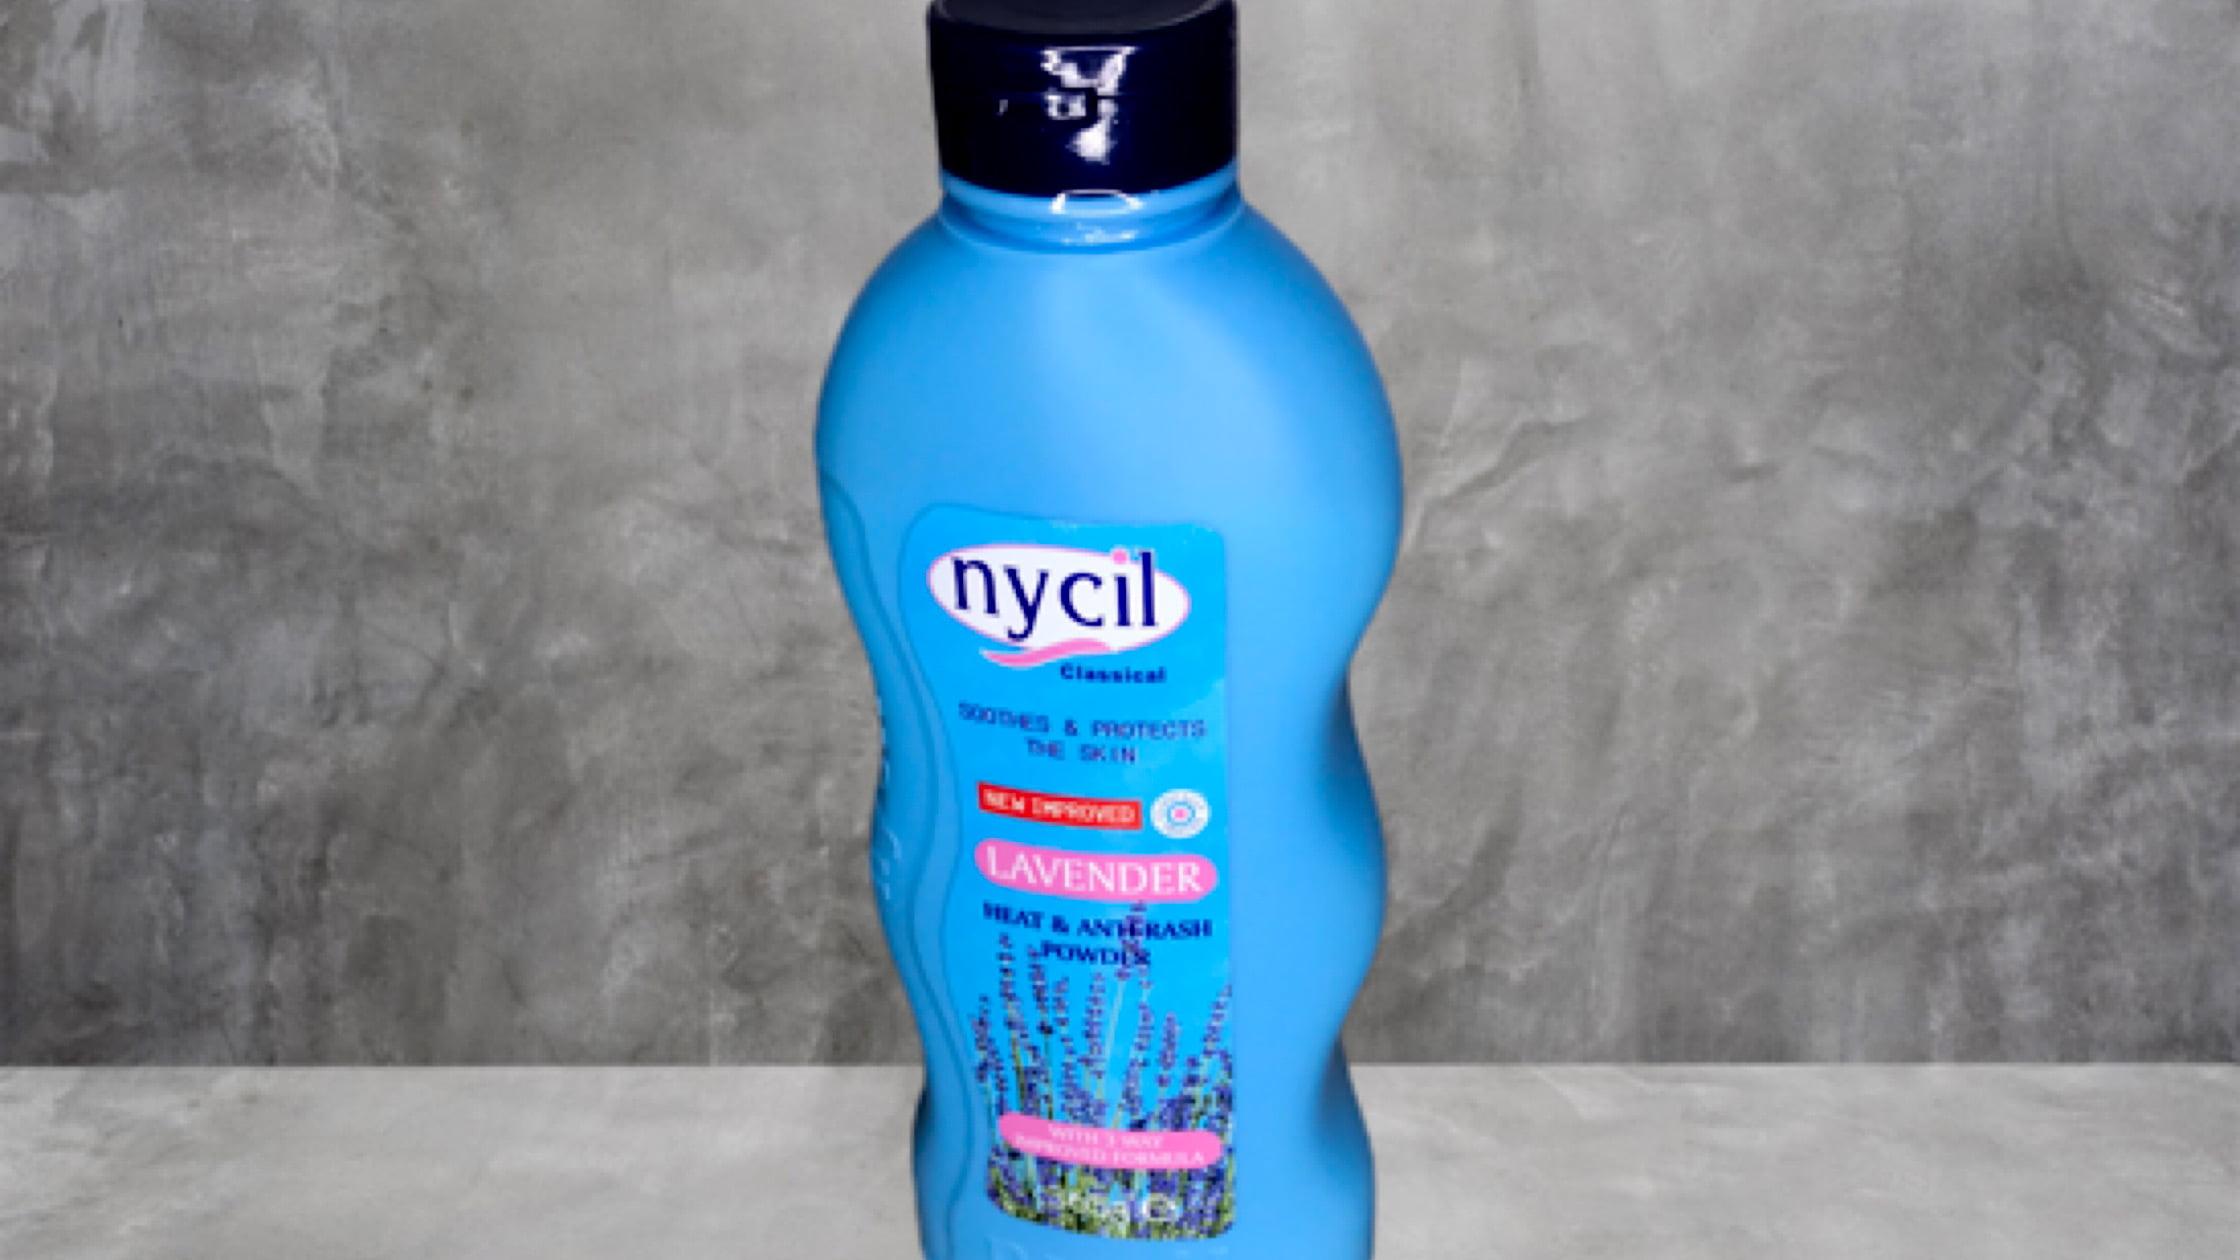 Nycil baby powder